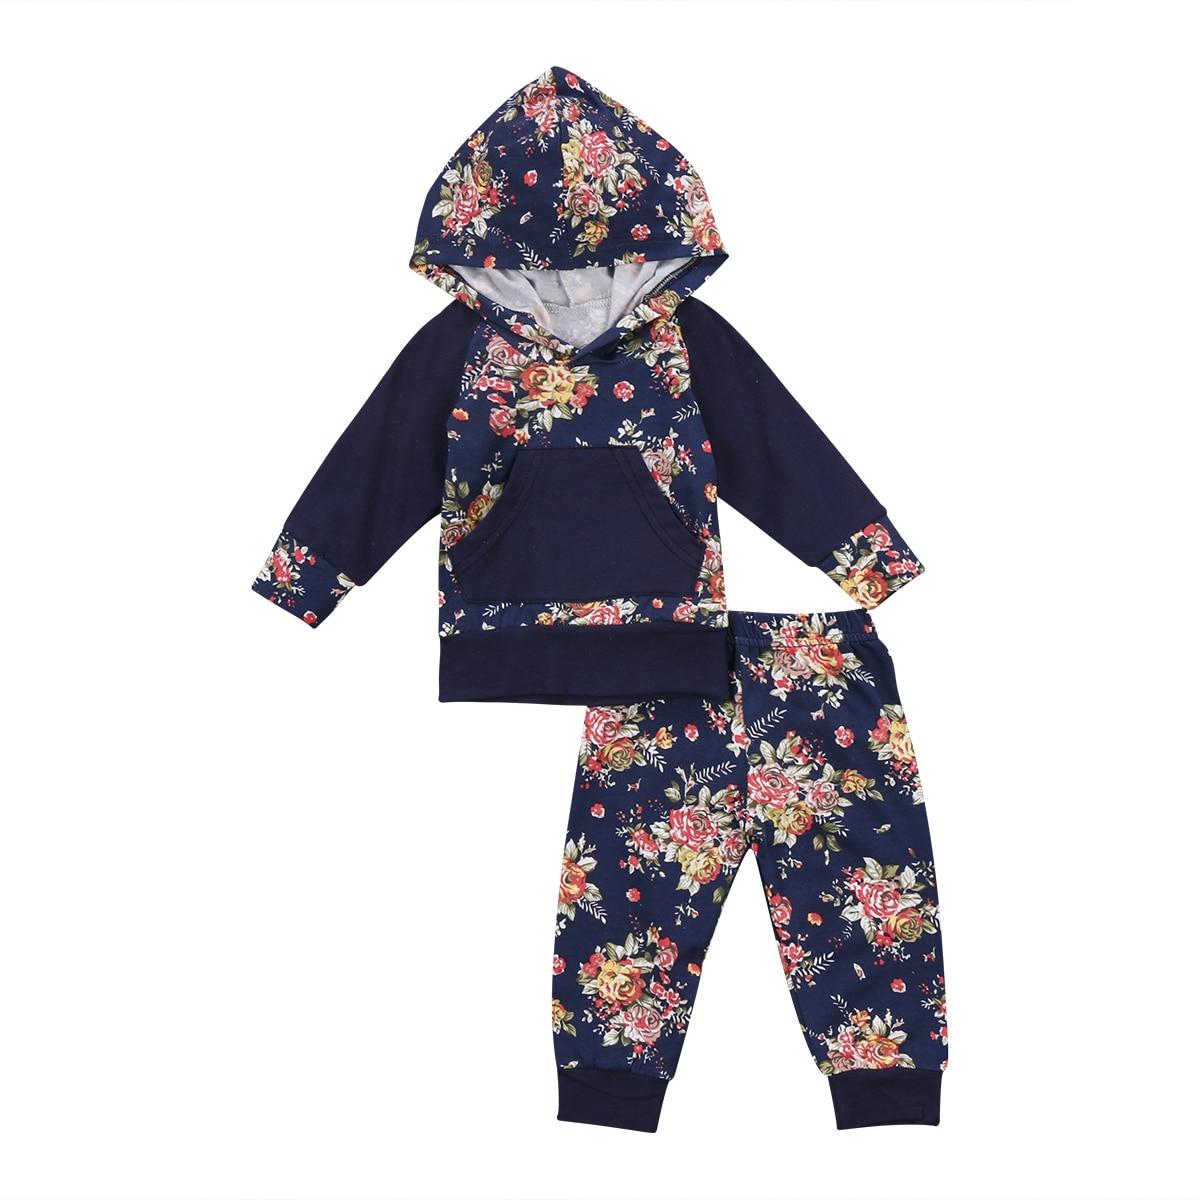 2Pcs Autumn Winter Newborn Toddler Infant Baby Girls Boys Floral Hoodies Tops Sweatshirt Legging Pants Outfits Set Clothes